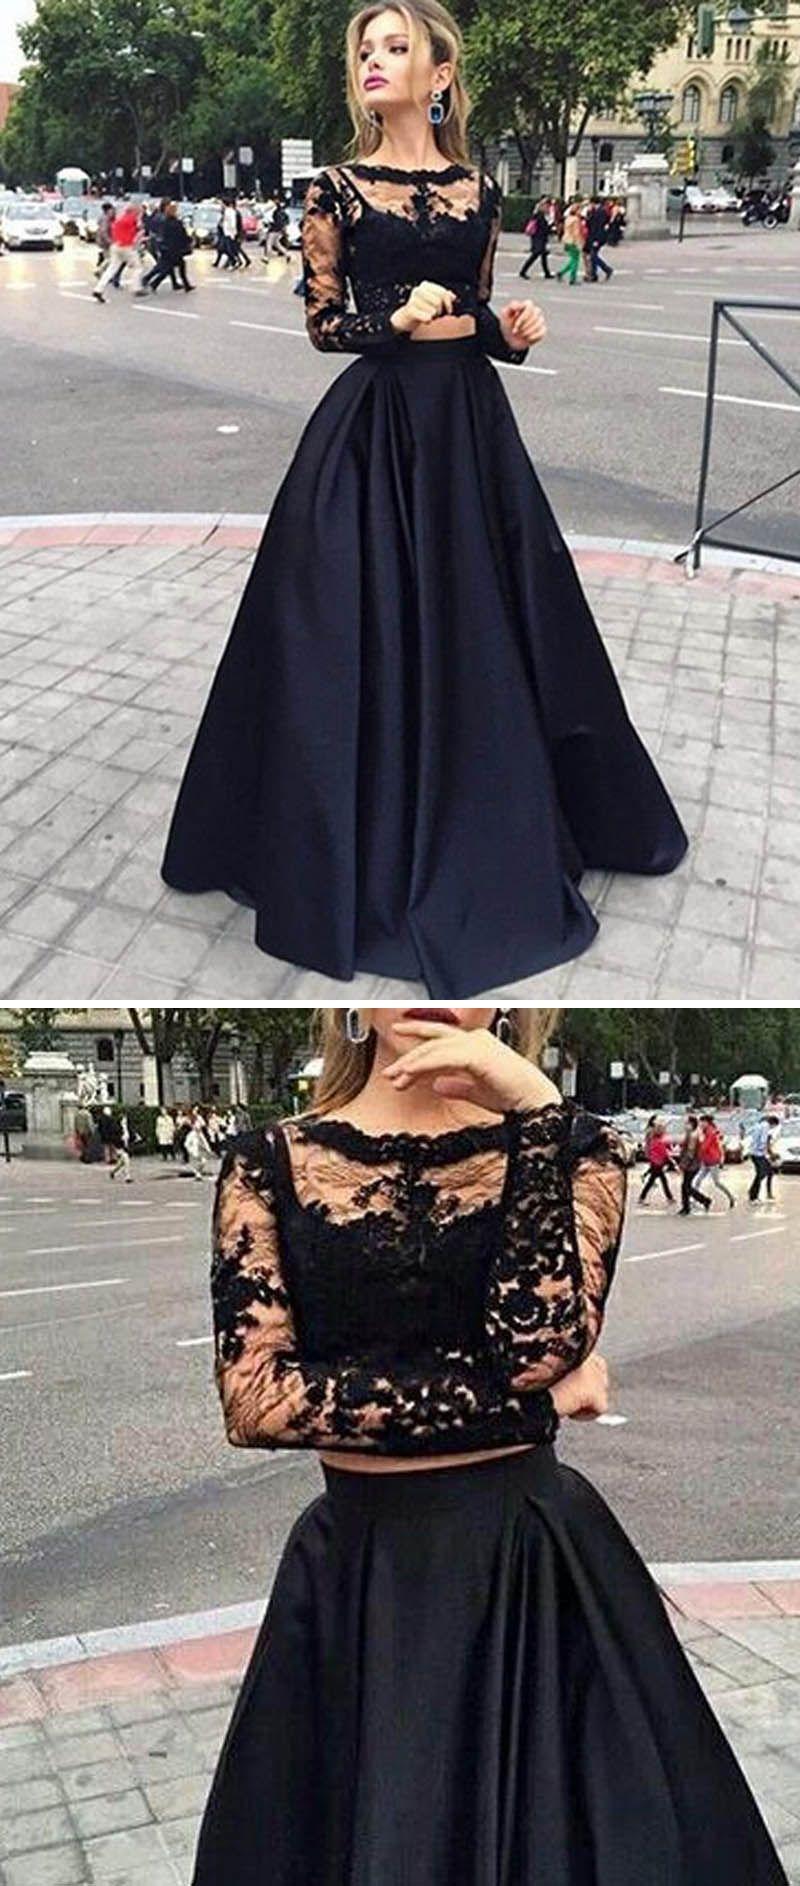 10e371225120b4 Girls Crop Top Long Senior Graduation Prom Gown Black Homecoming ...